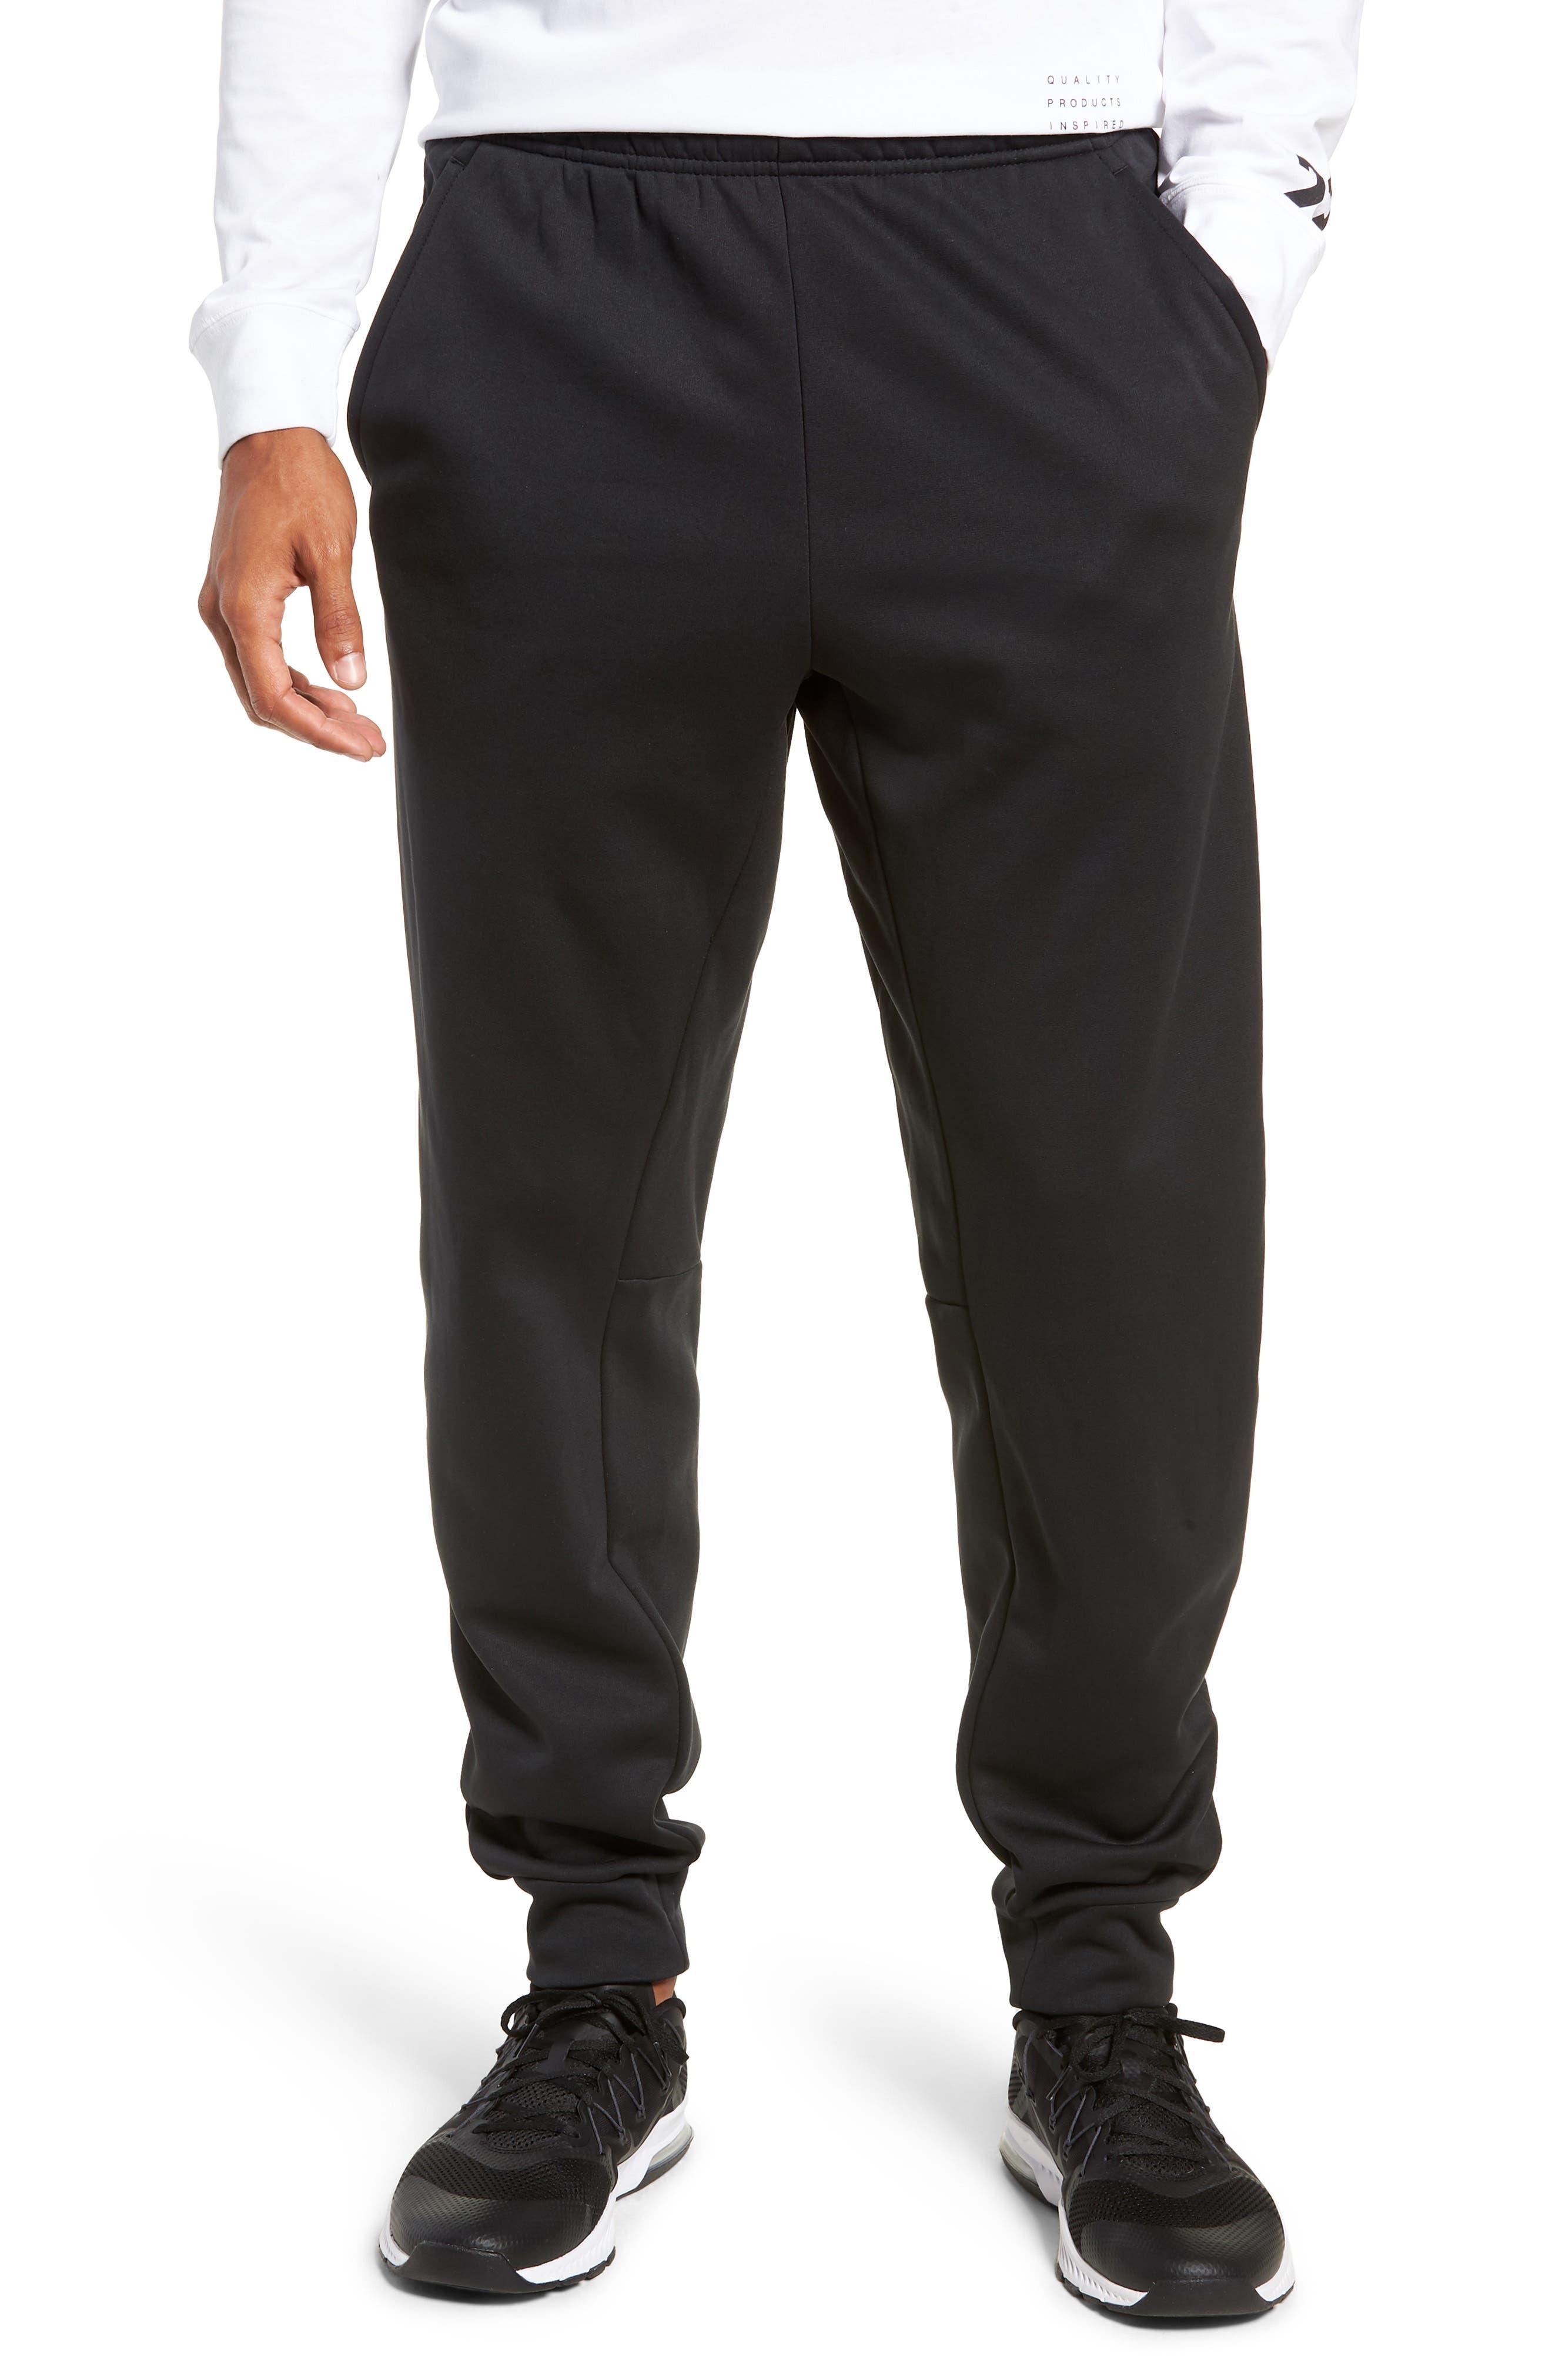 NIKE, Therma Tapered Pants, Main thumbnail 1, color, BLACK/ WHITE